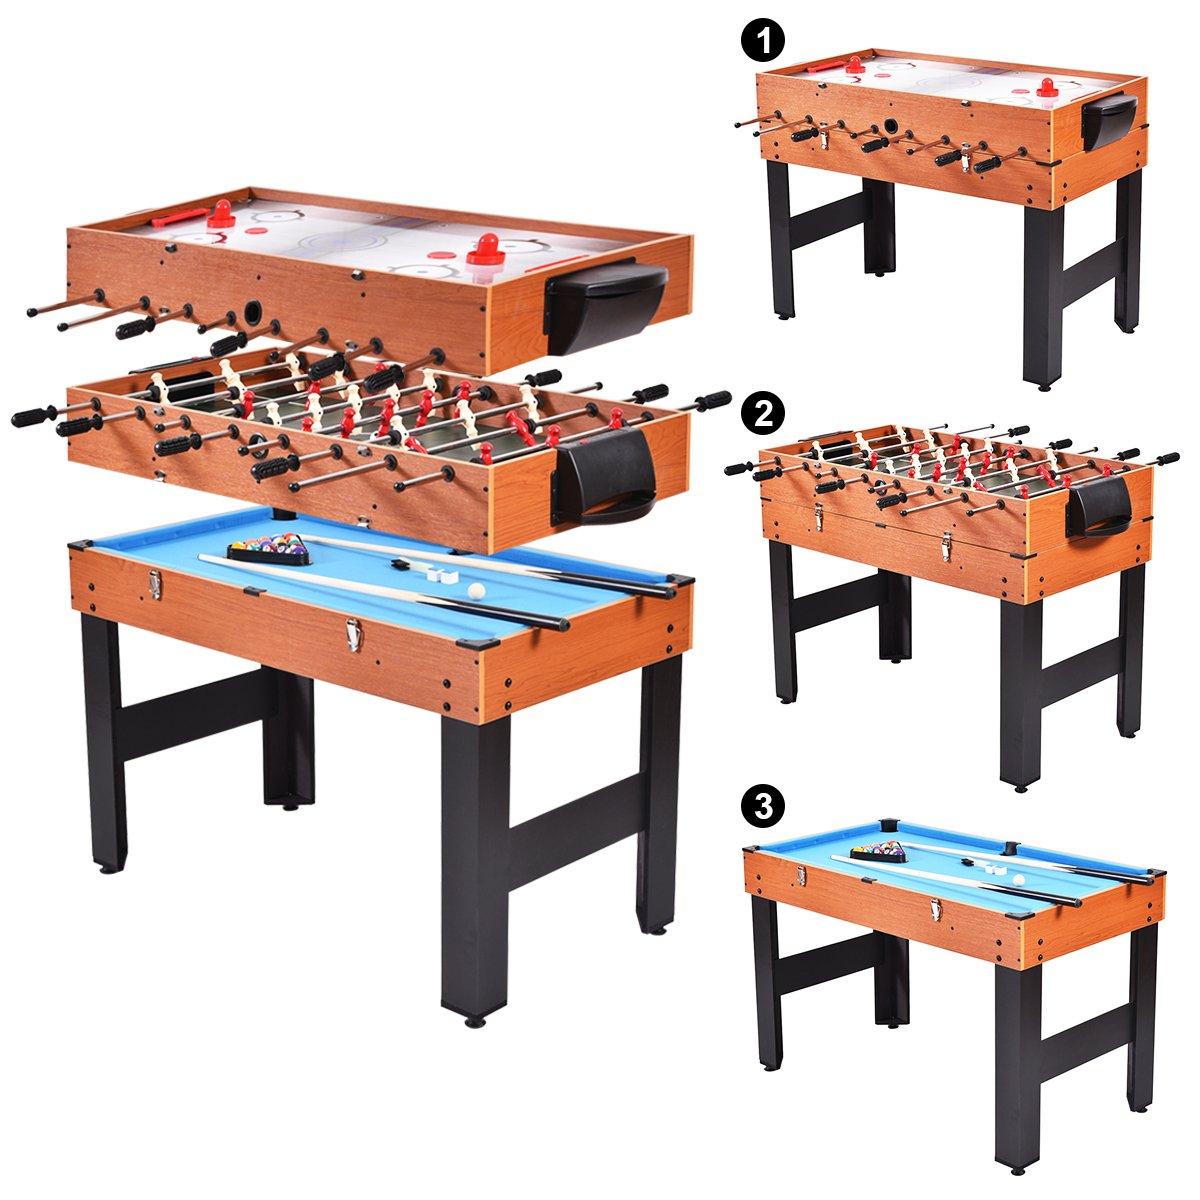 GYMAX Multi Game Table, 3-in-1 Multifunction Foosball Billiard Slide Hockey Combo Arcade Game Table